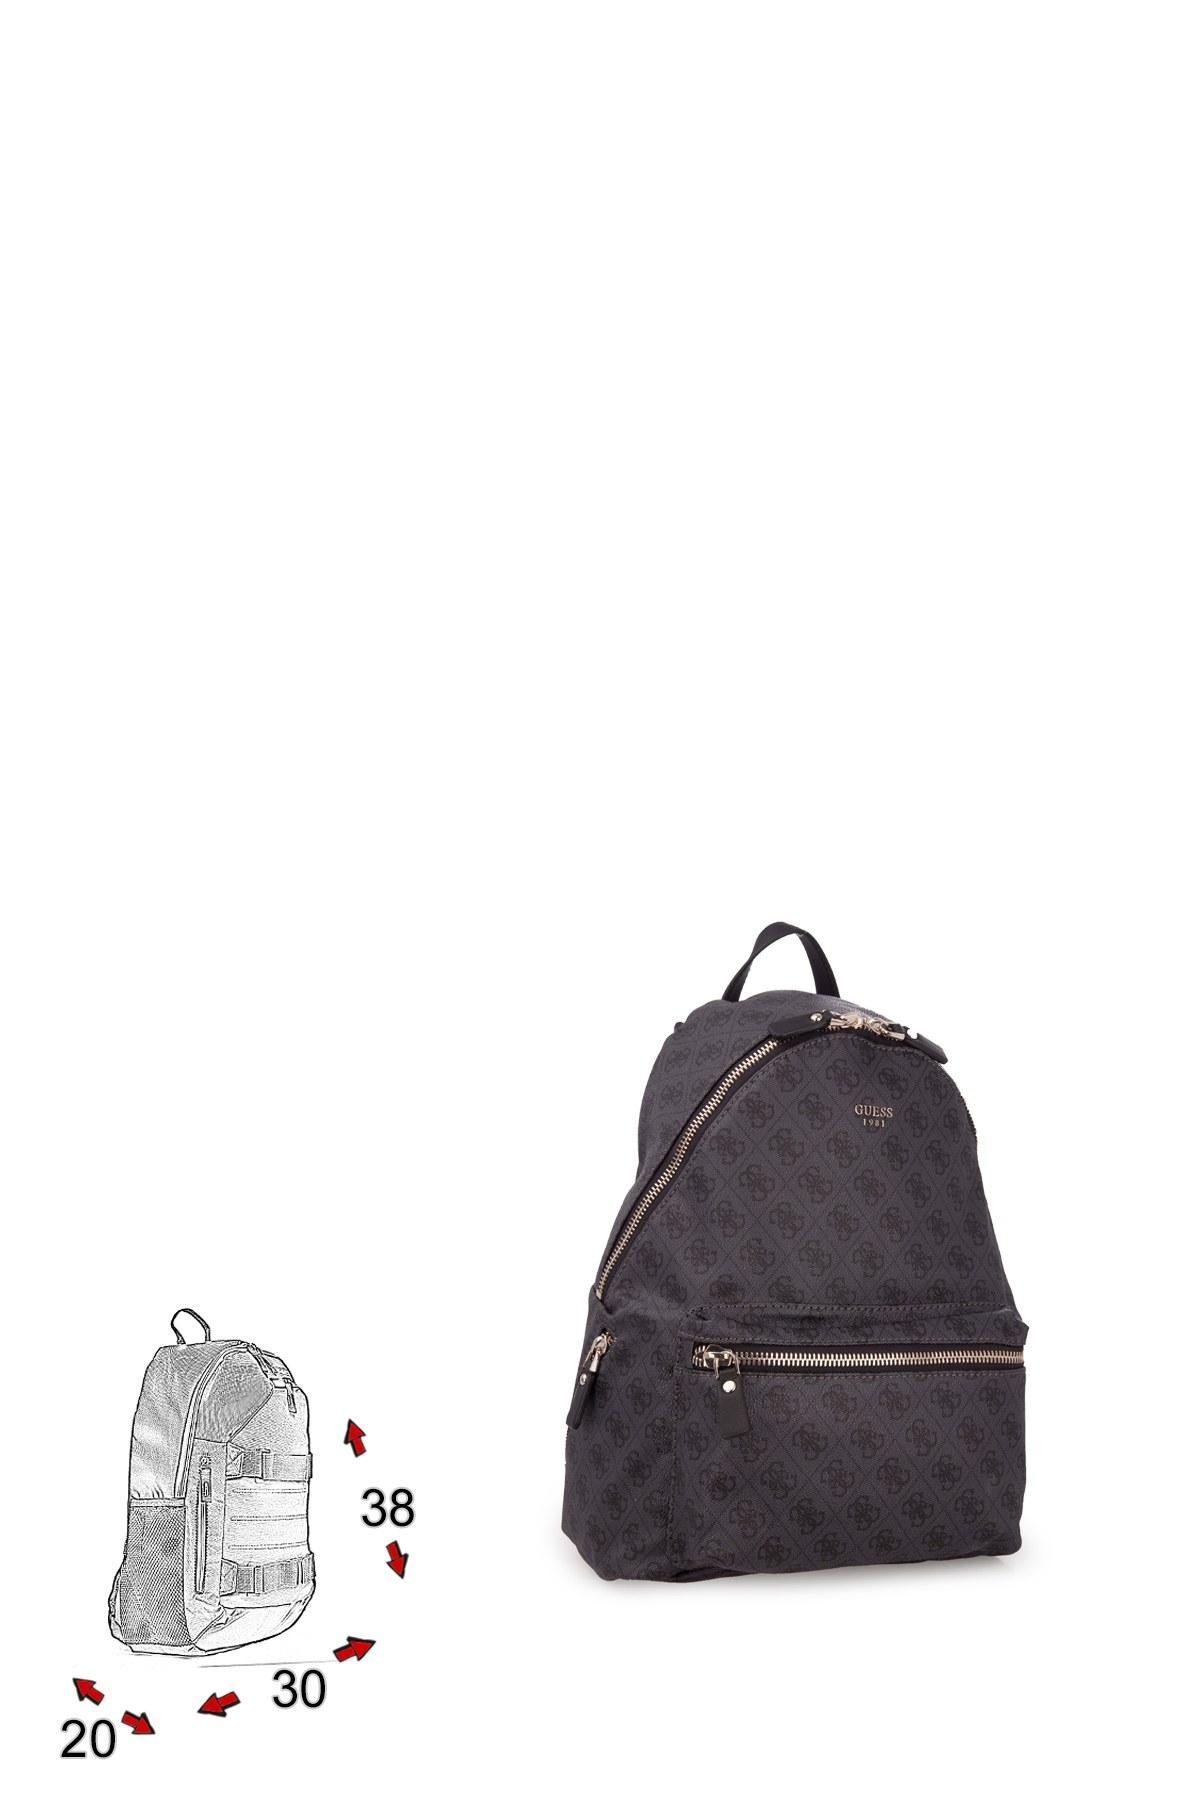 Guess Leeza Backpack Kadın Çanta HWSC4557320 COA KOYU GRİ